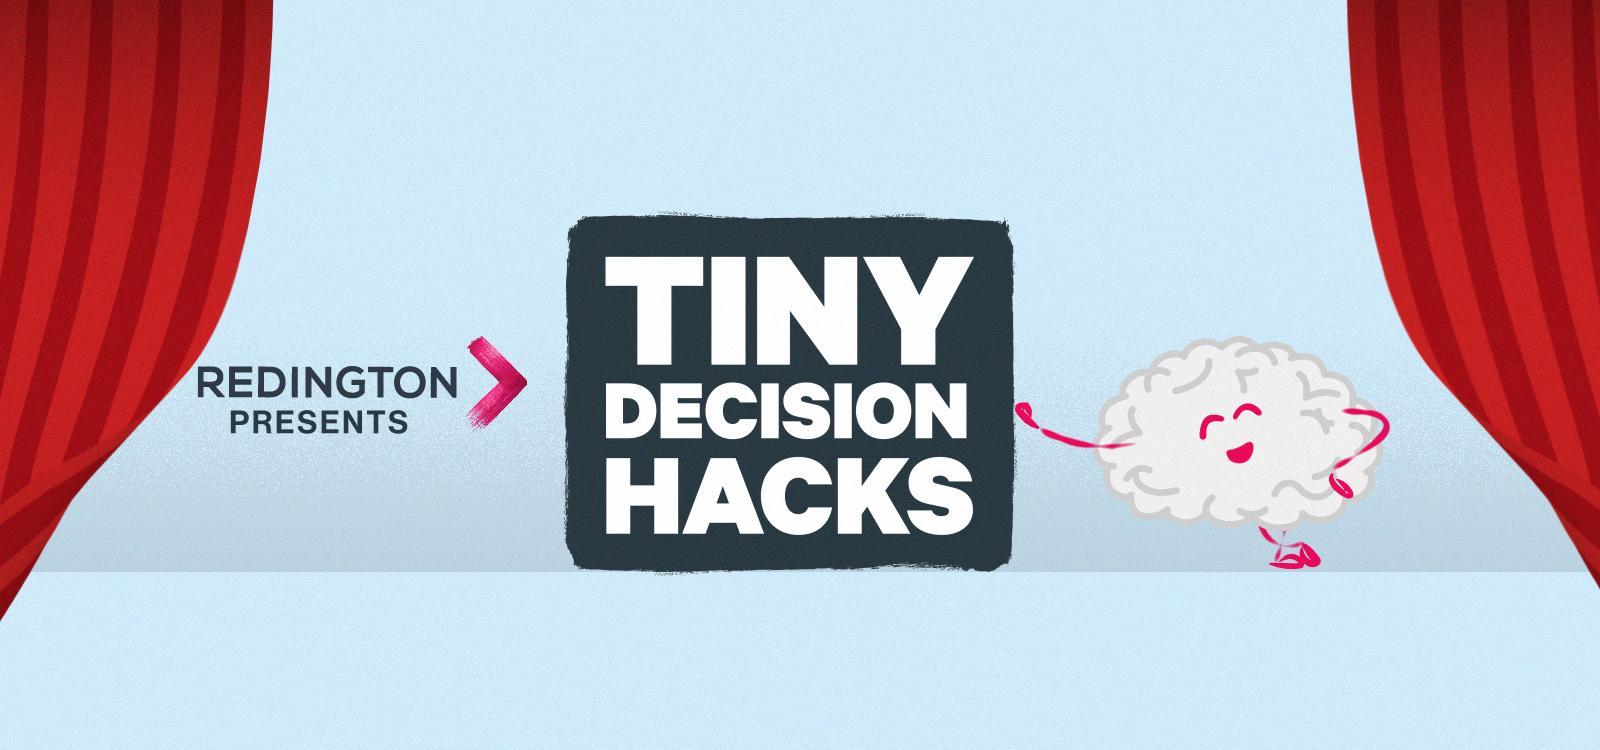 Tiny Decision Hacks